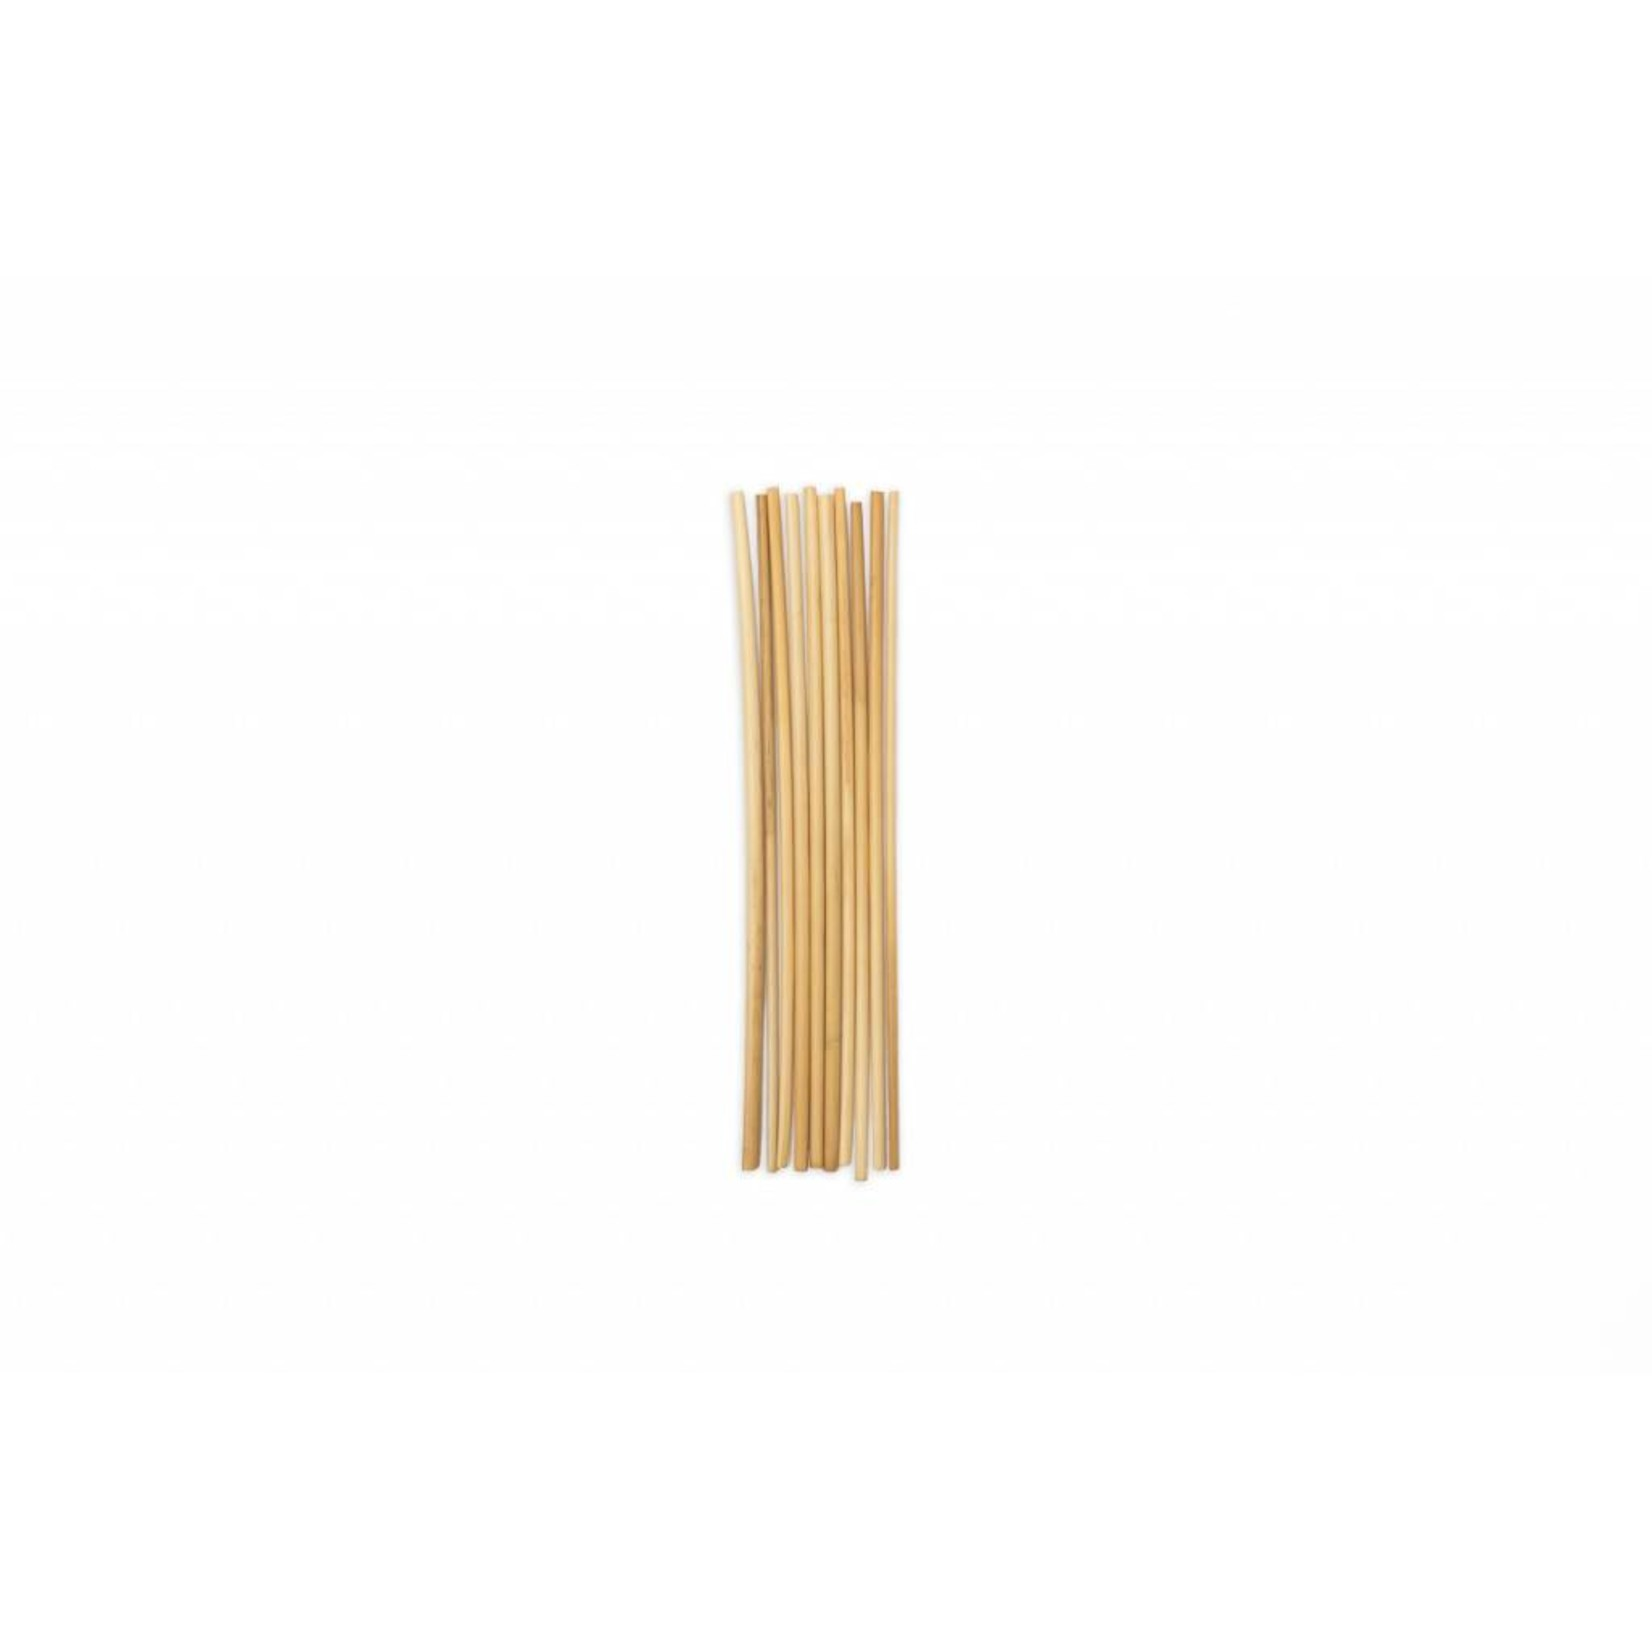 Straw by straw Straws made of straw - 100% natural